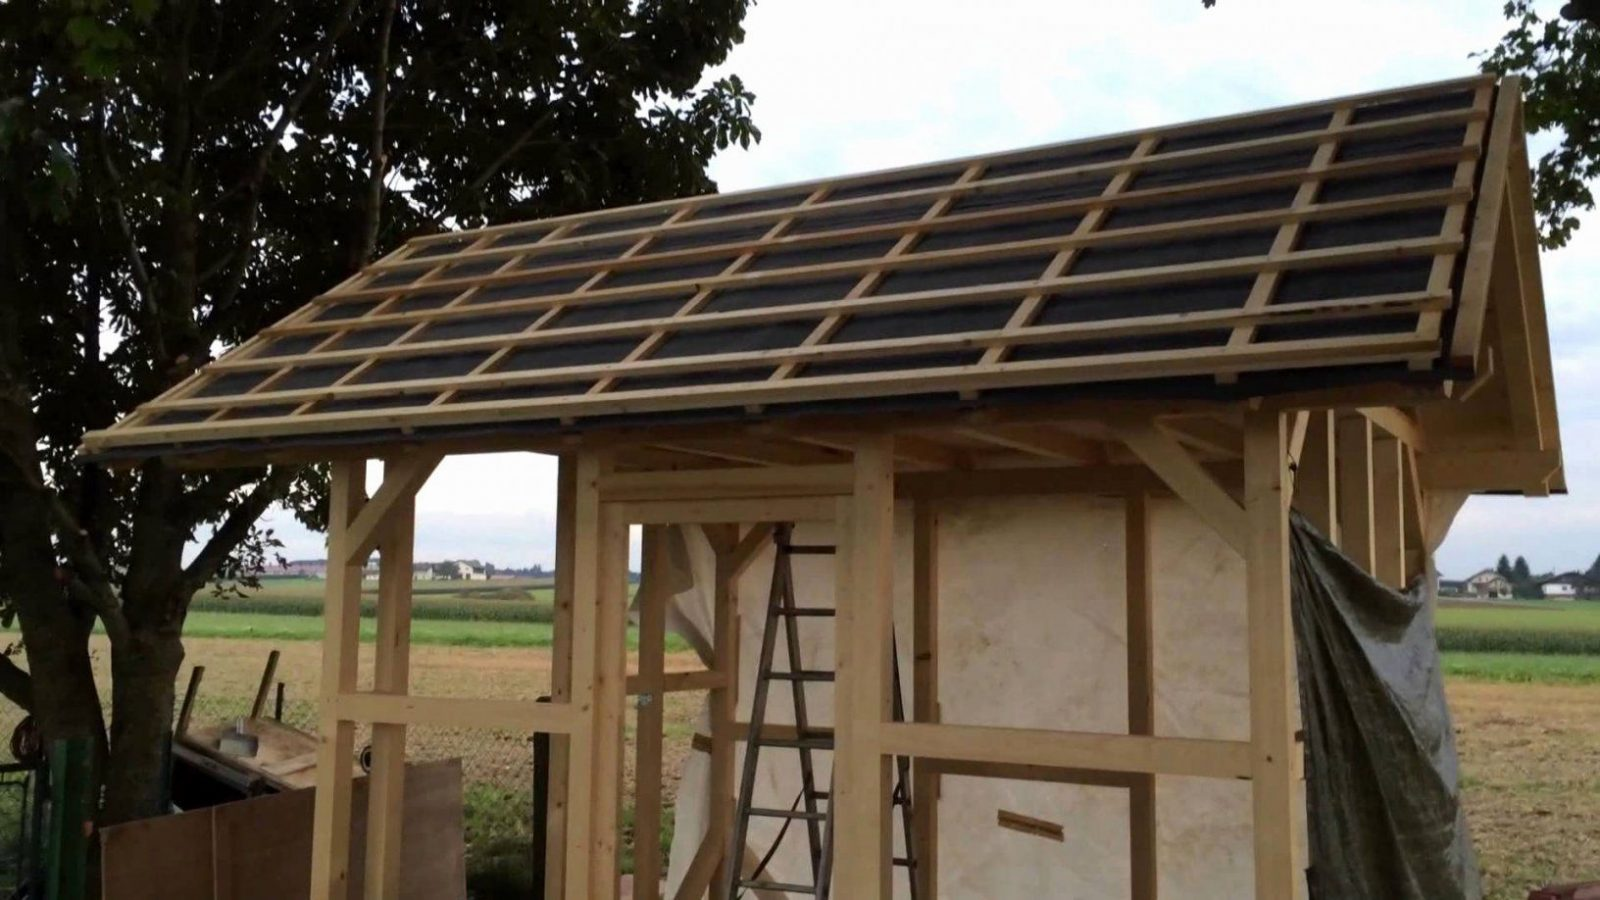 40 Frisch Foto Of Holz Pavillon 3X3 Selber Bauen 155636 2018  New von Gartenpavillon Aus Holz Selber Bauen Photo